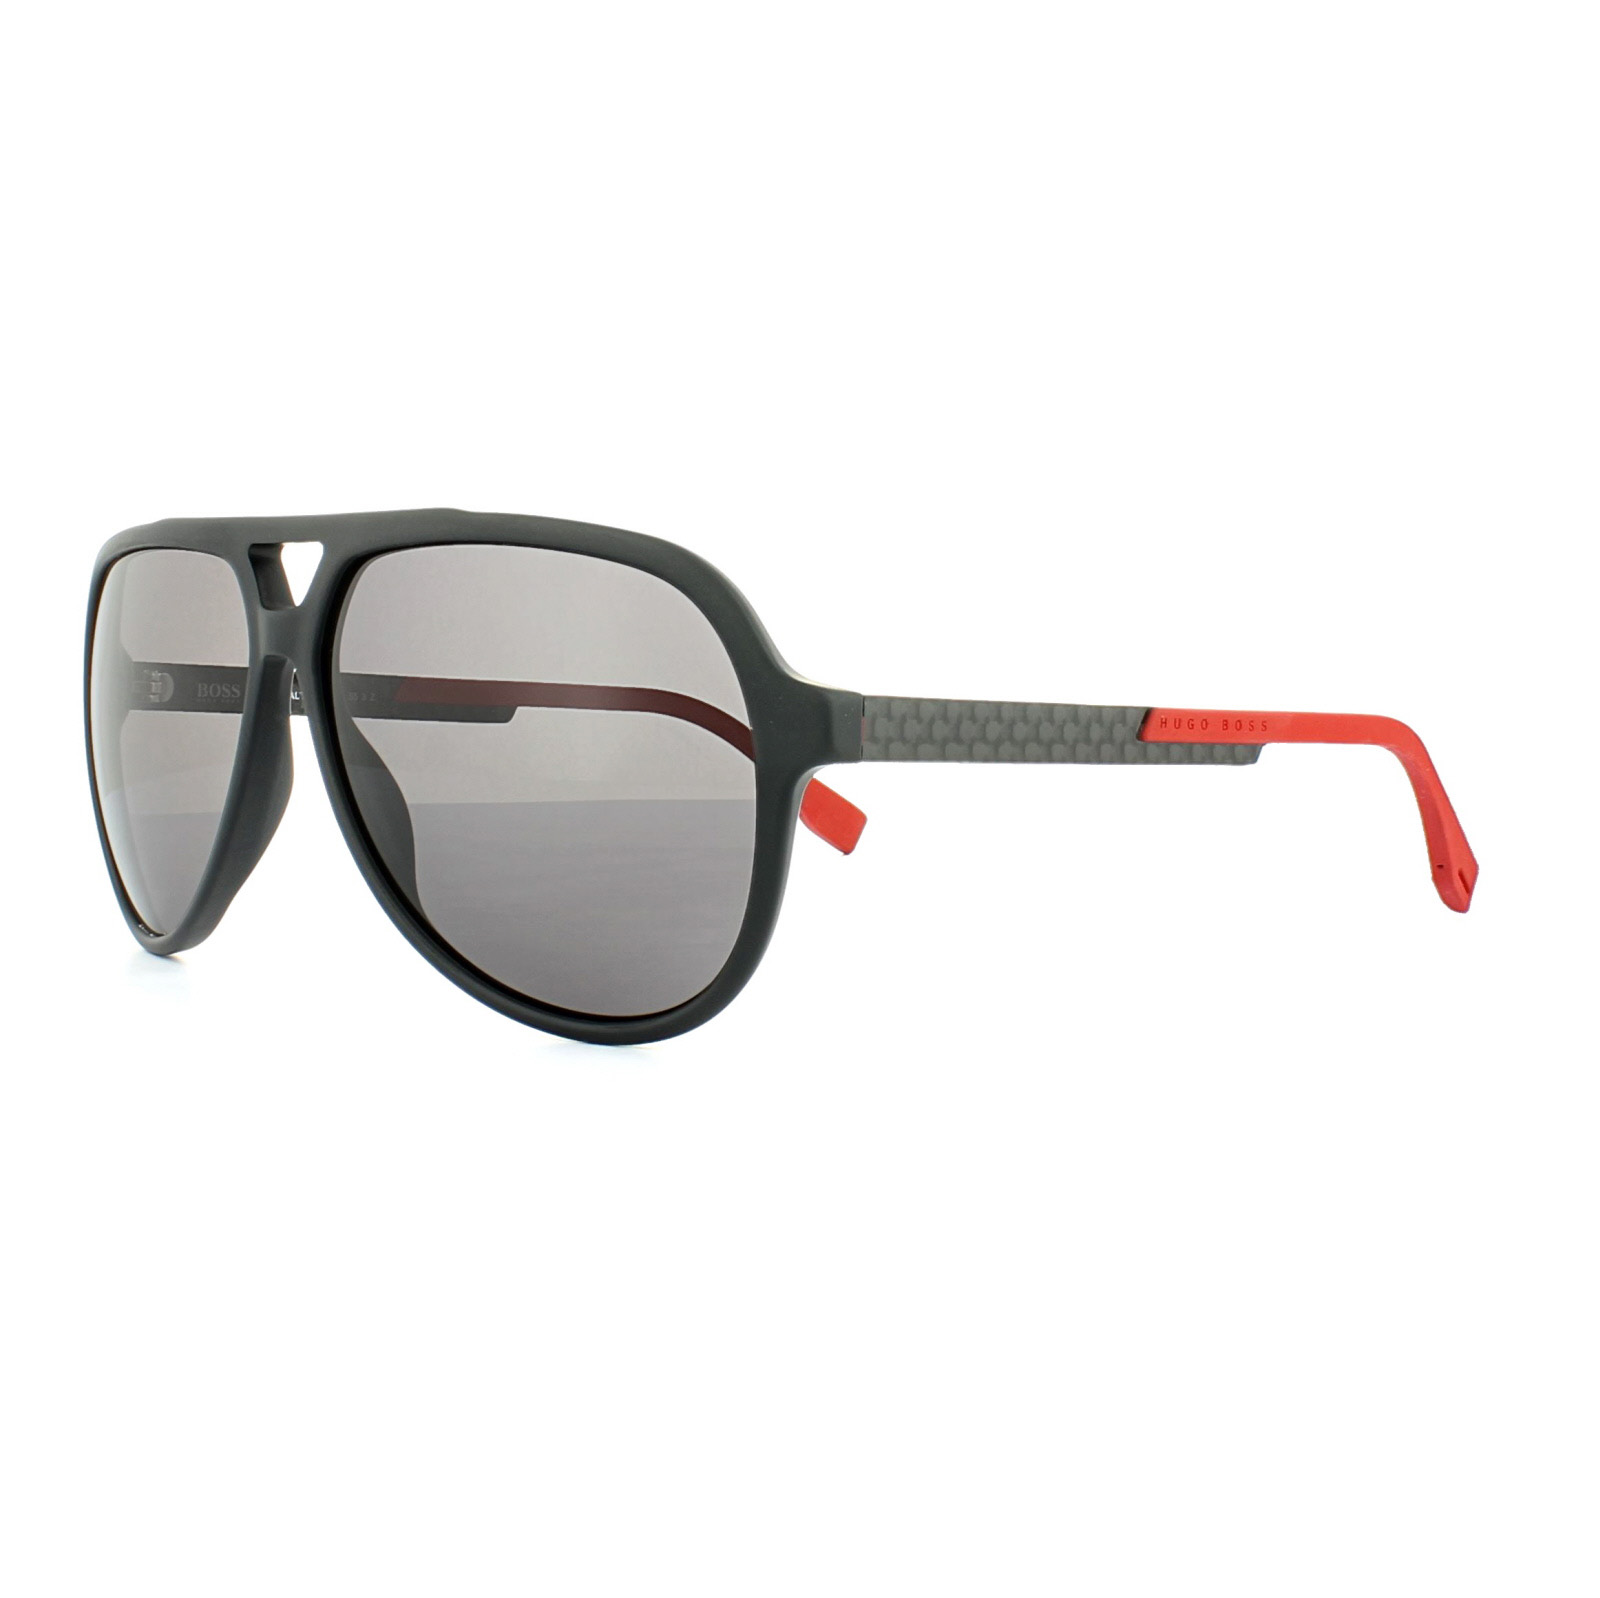 c31b75abdc6c Sentinel Hugo Boss Sunglasses 0731 KDG 3H Black Carbon Red Grey Polarized